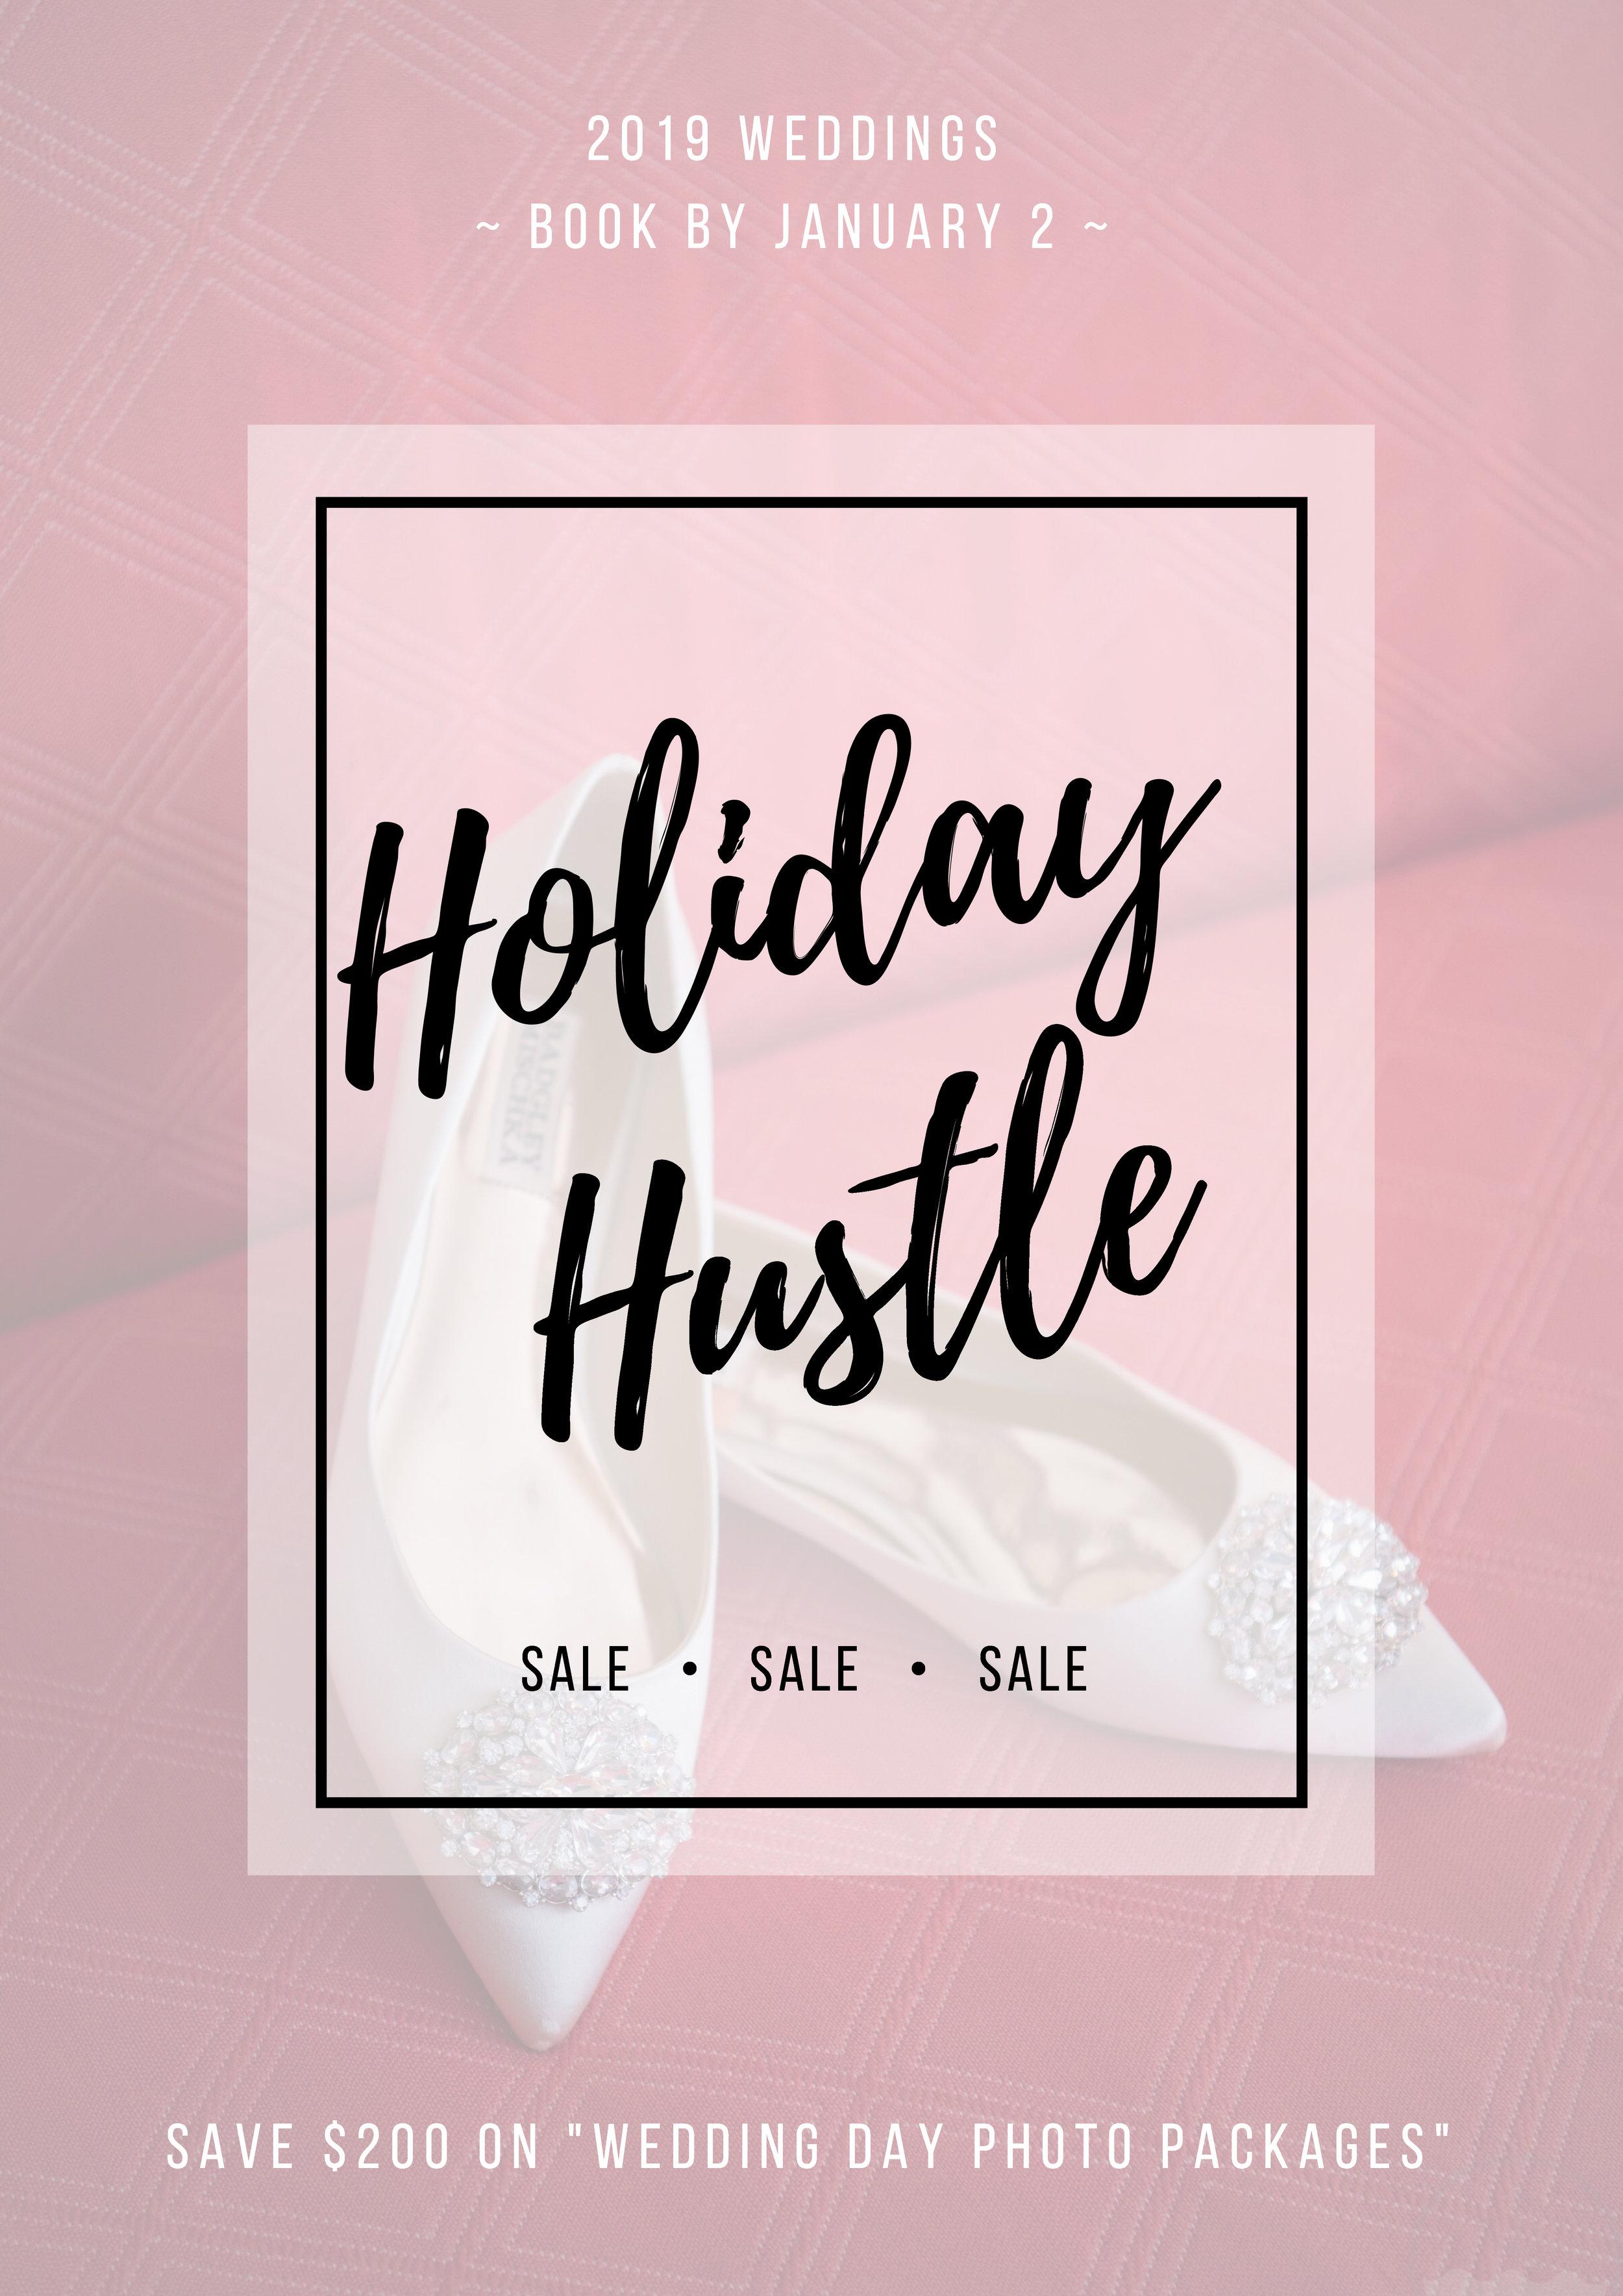 Holiday Hustle Sale 2019.jpg